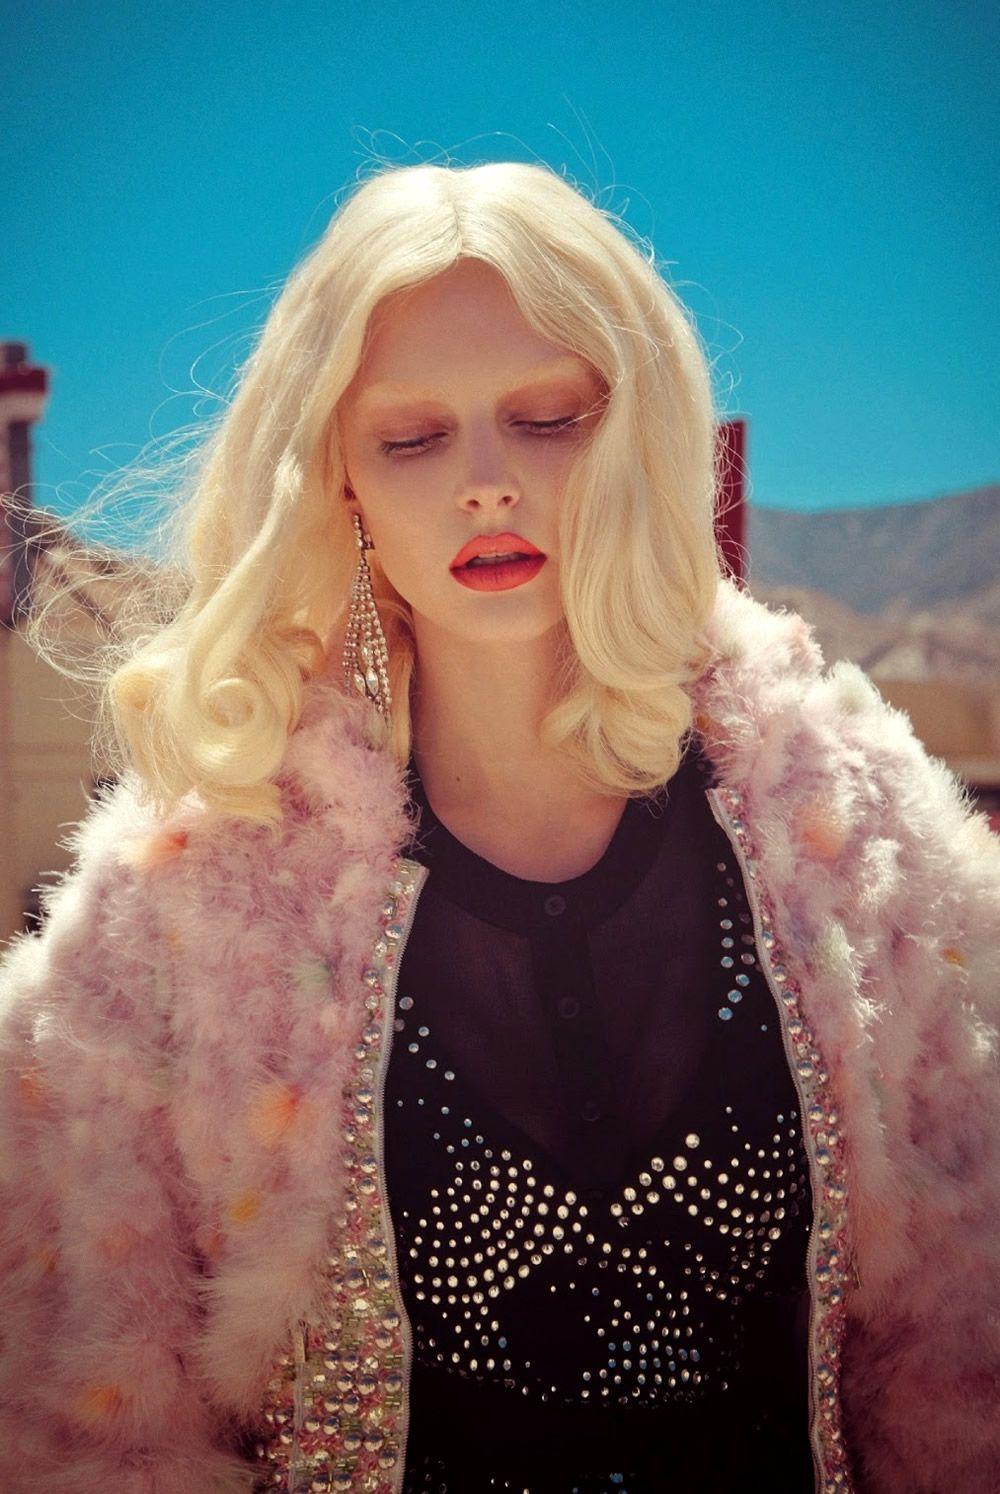 Auguste Abeliunaite by Sofia Sanchez & Mauro Mongiello for Numéro September 2014 #blonde diva